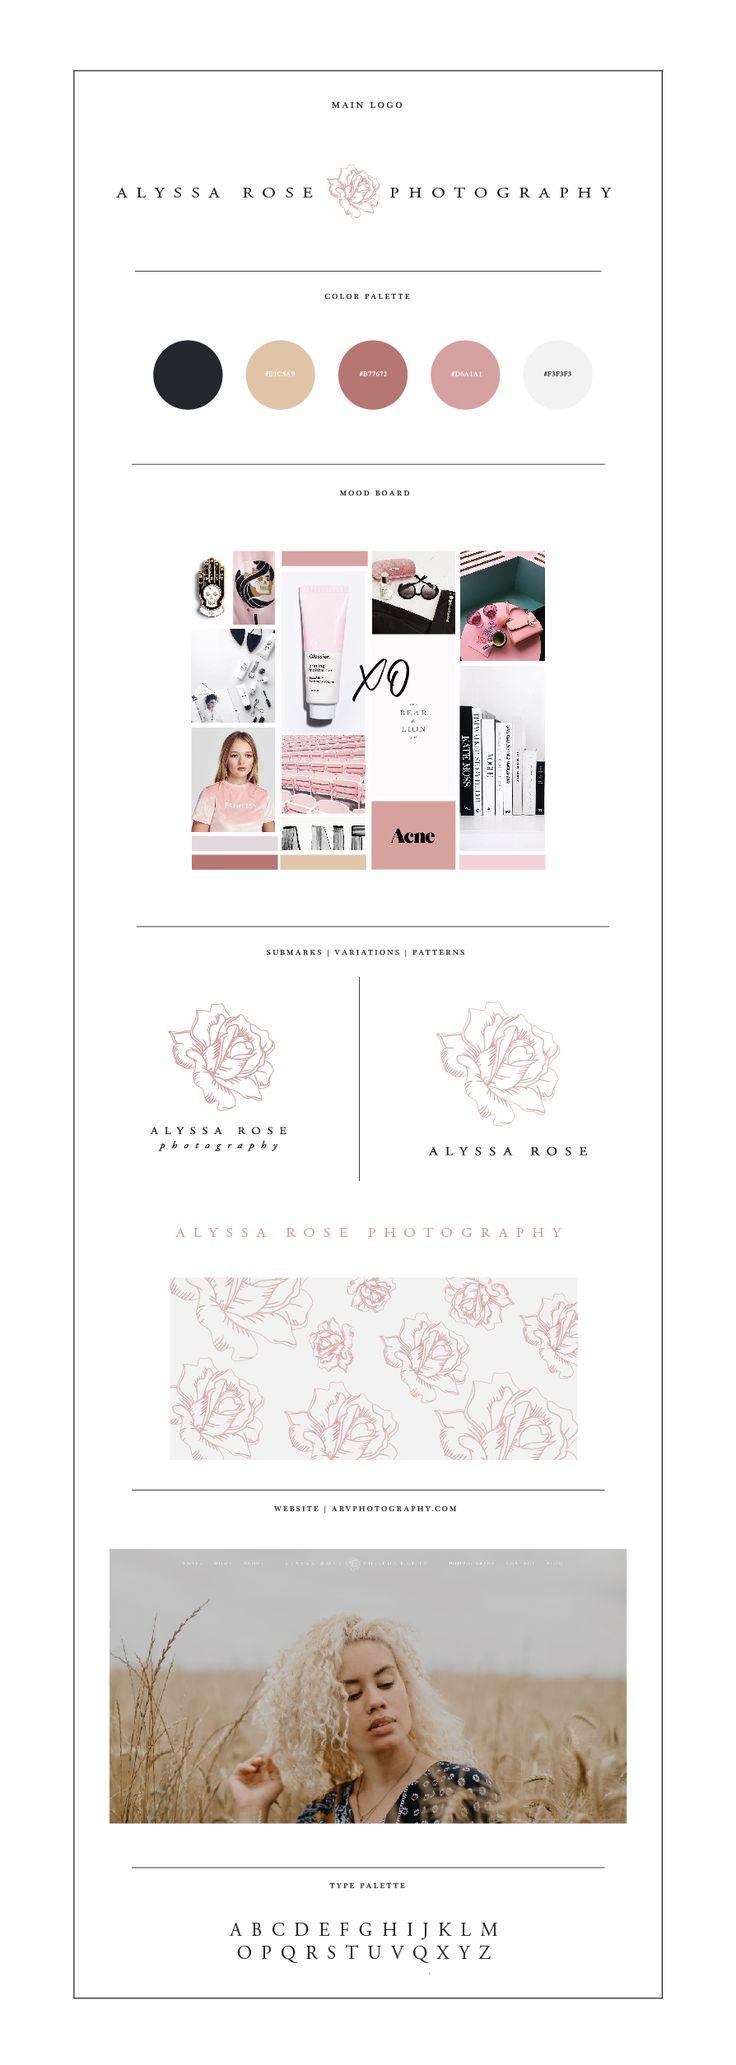 Photography Branding Design for Alyssa Rose Photography - By Designed by Eden | www.designedbyeden.com